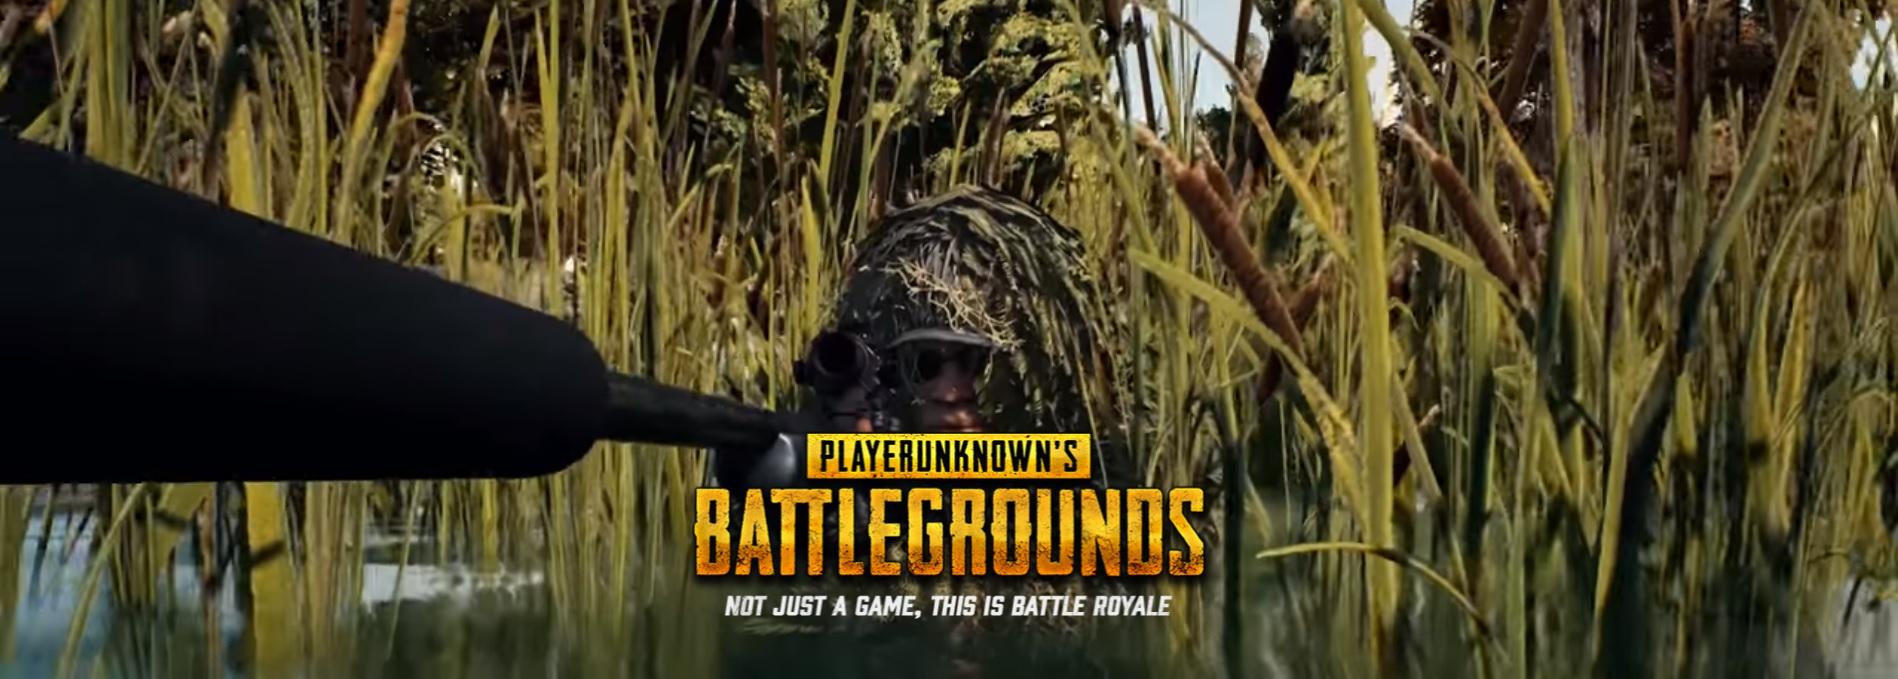 PUBG-Battle-Royale.jpg